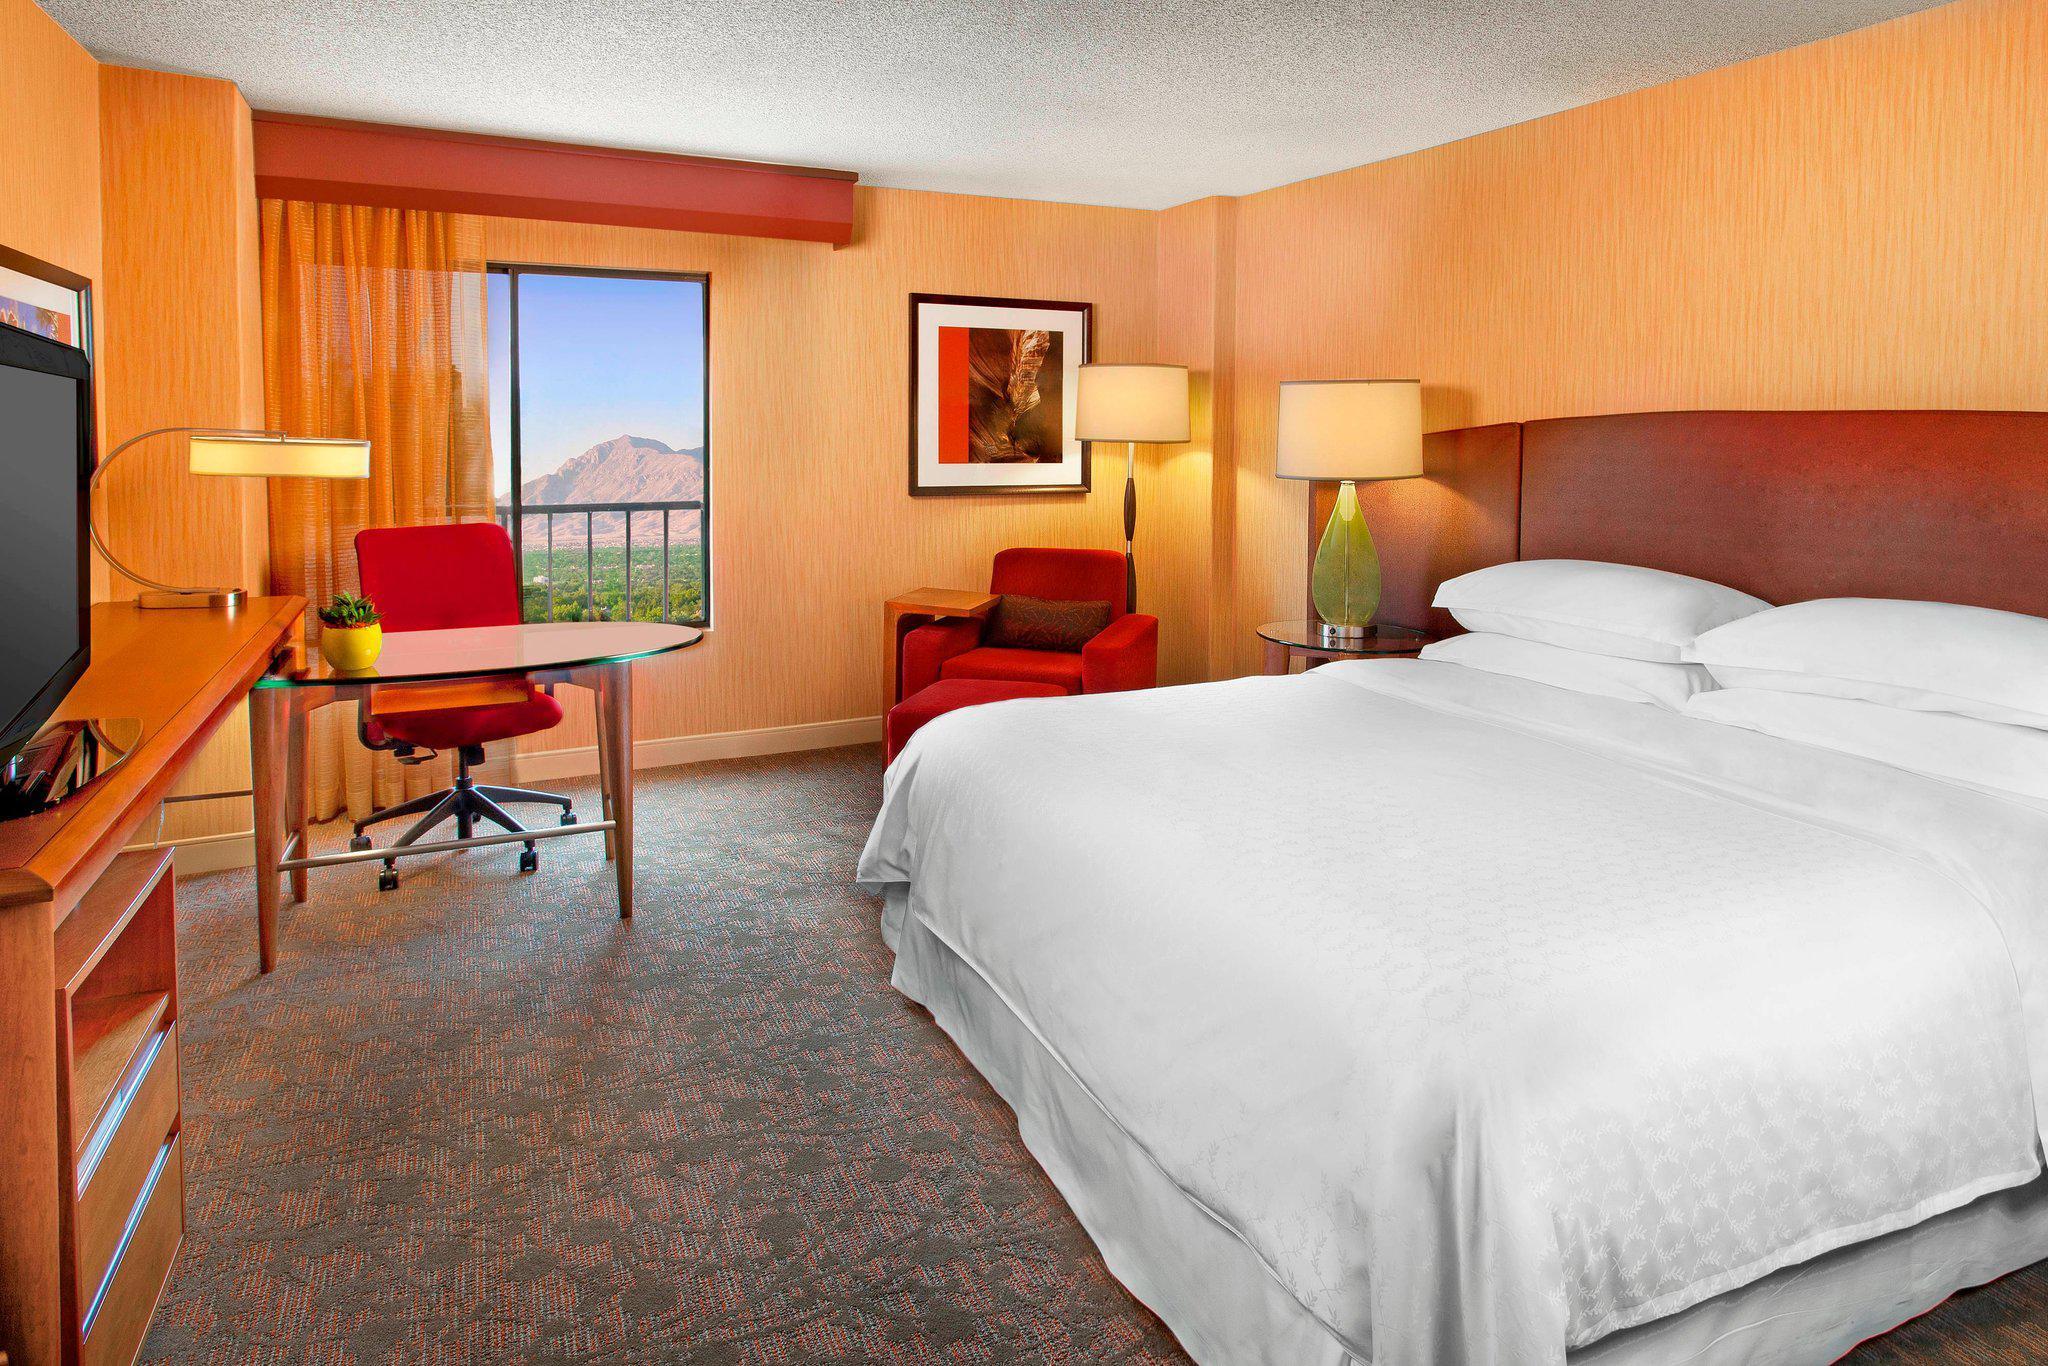 Sheraton Albuquerque Airport Hotel